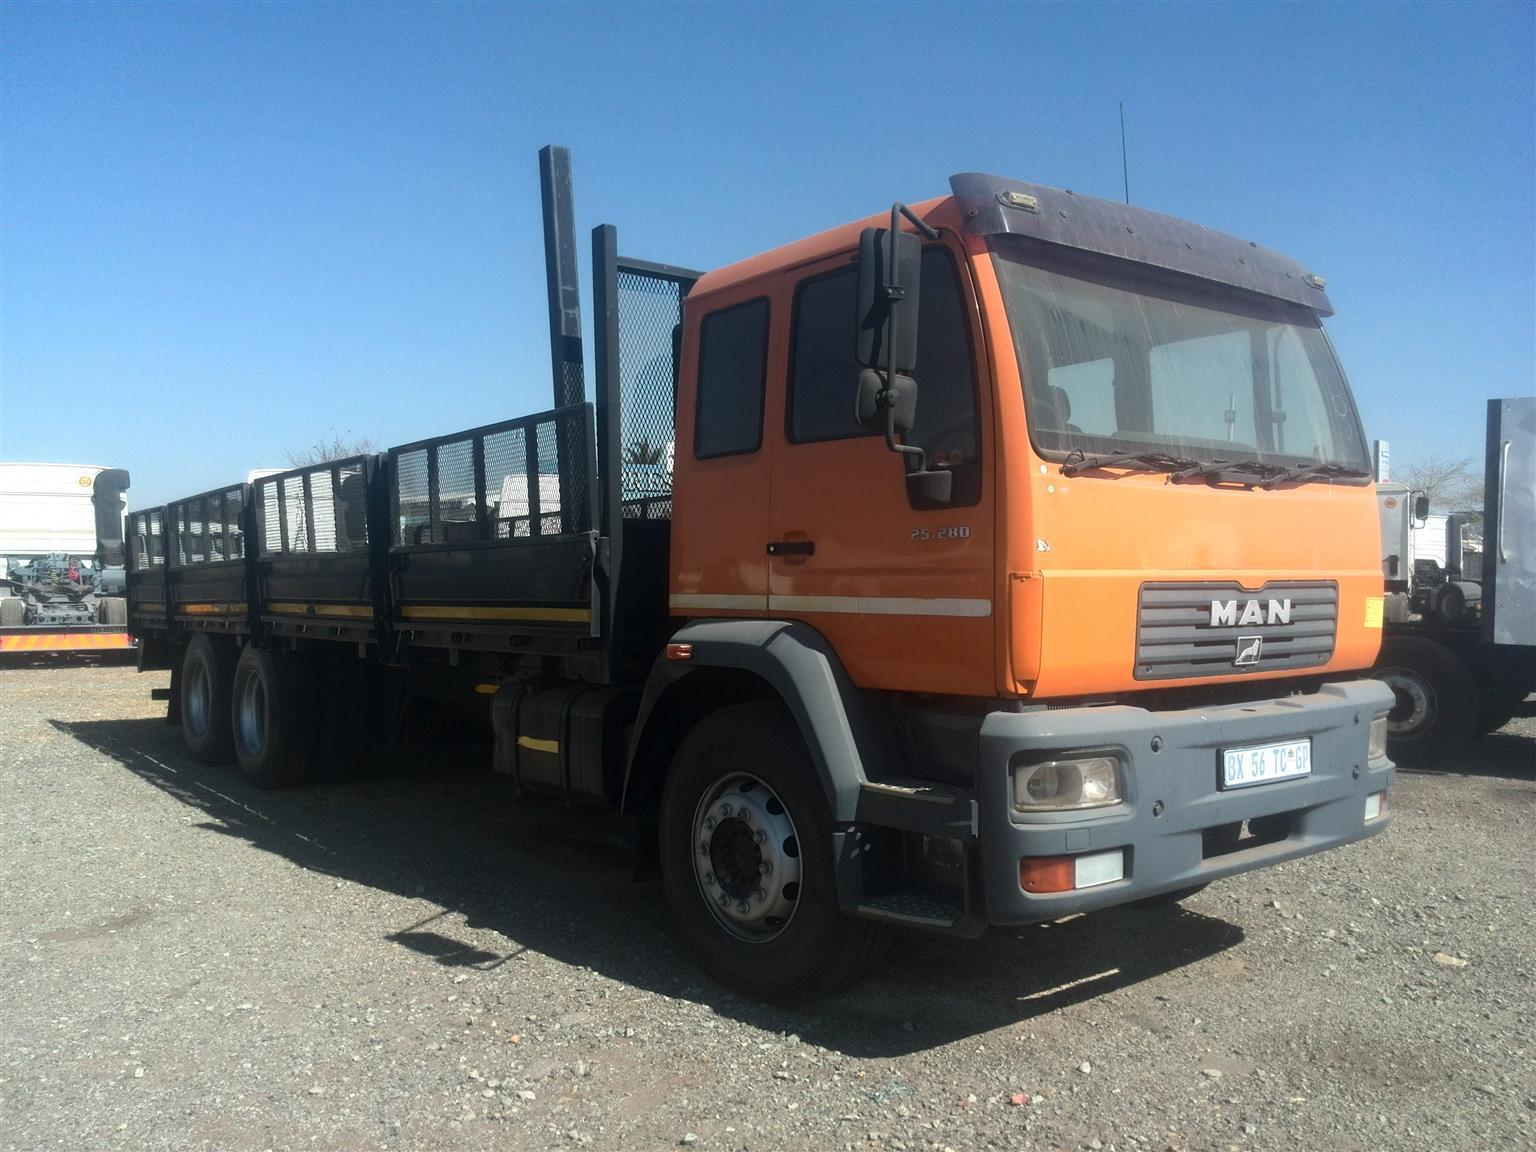 2004 - MAN TRUCK Posted by Lemeshen Pillay UBUNTU Truck sales